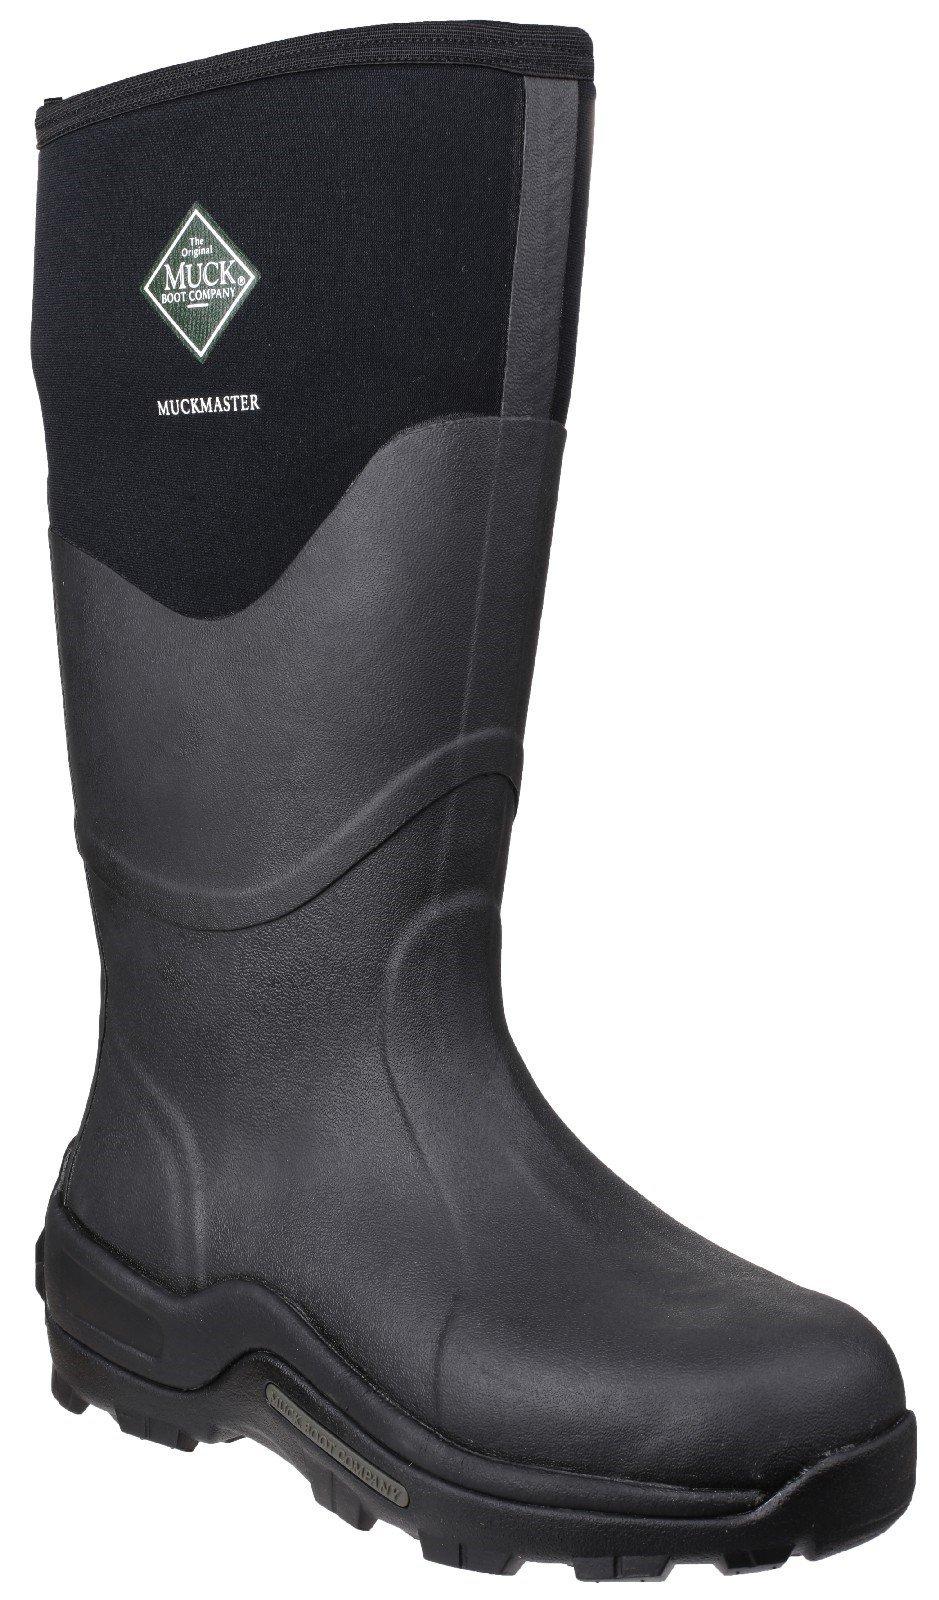 Muck Boots Unisex Muckmaster Hi Wellington Boot Various Colours 23387 - Black 4